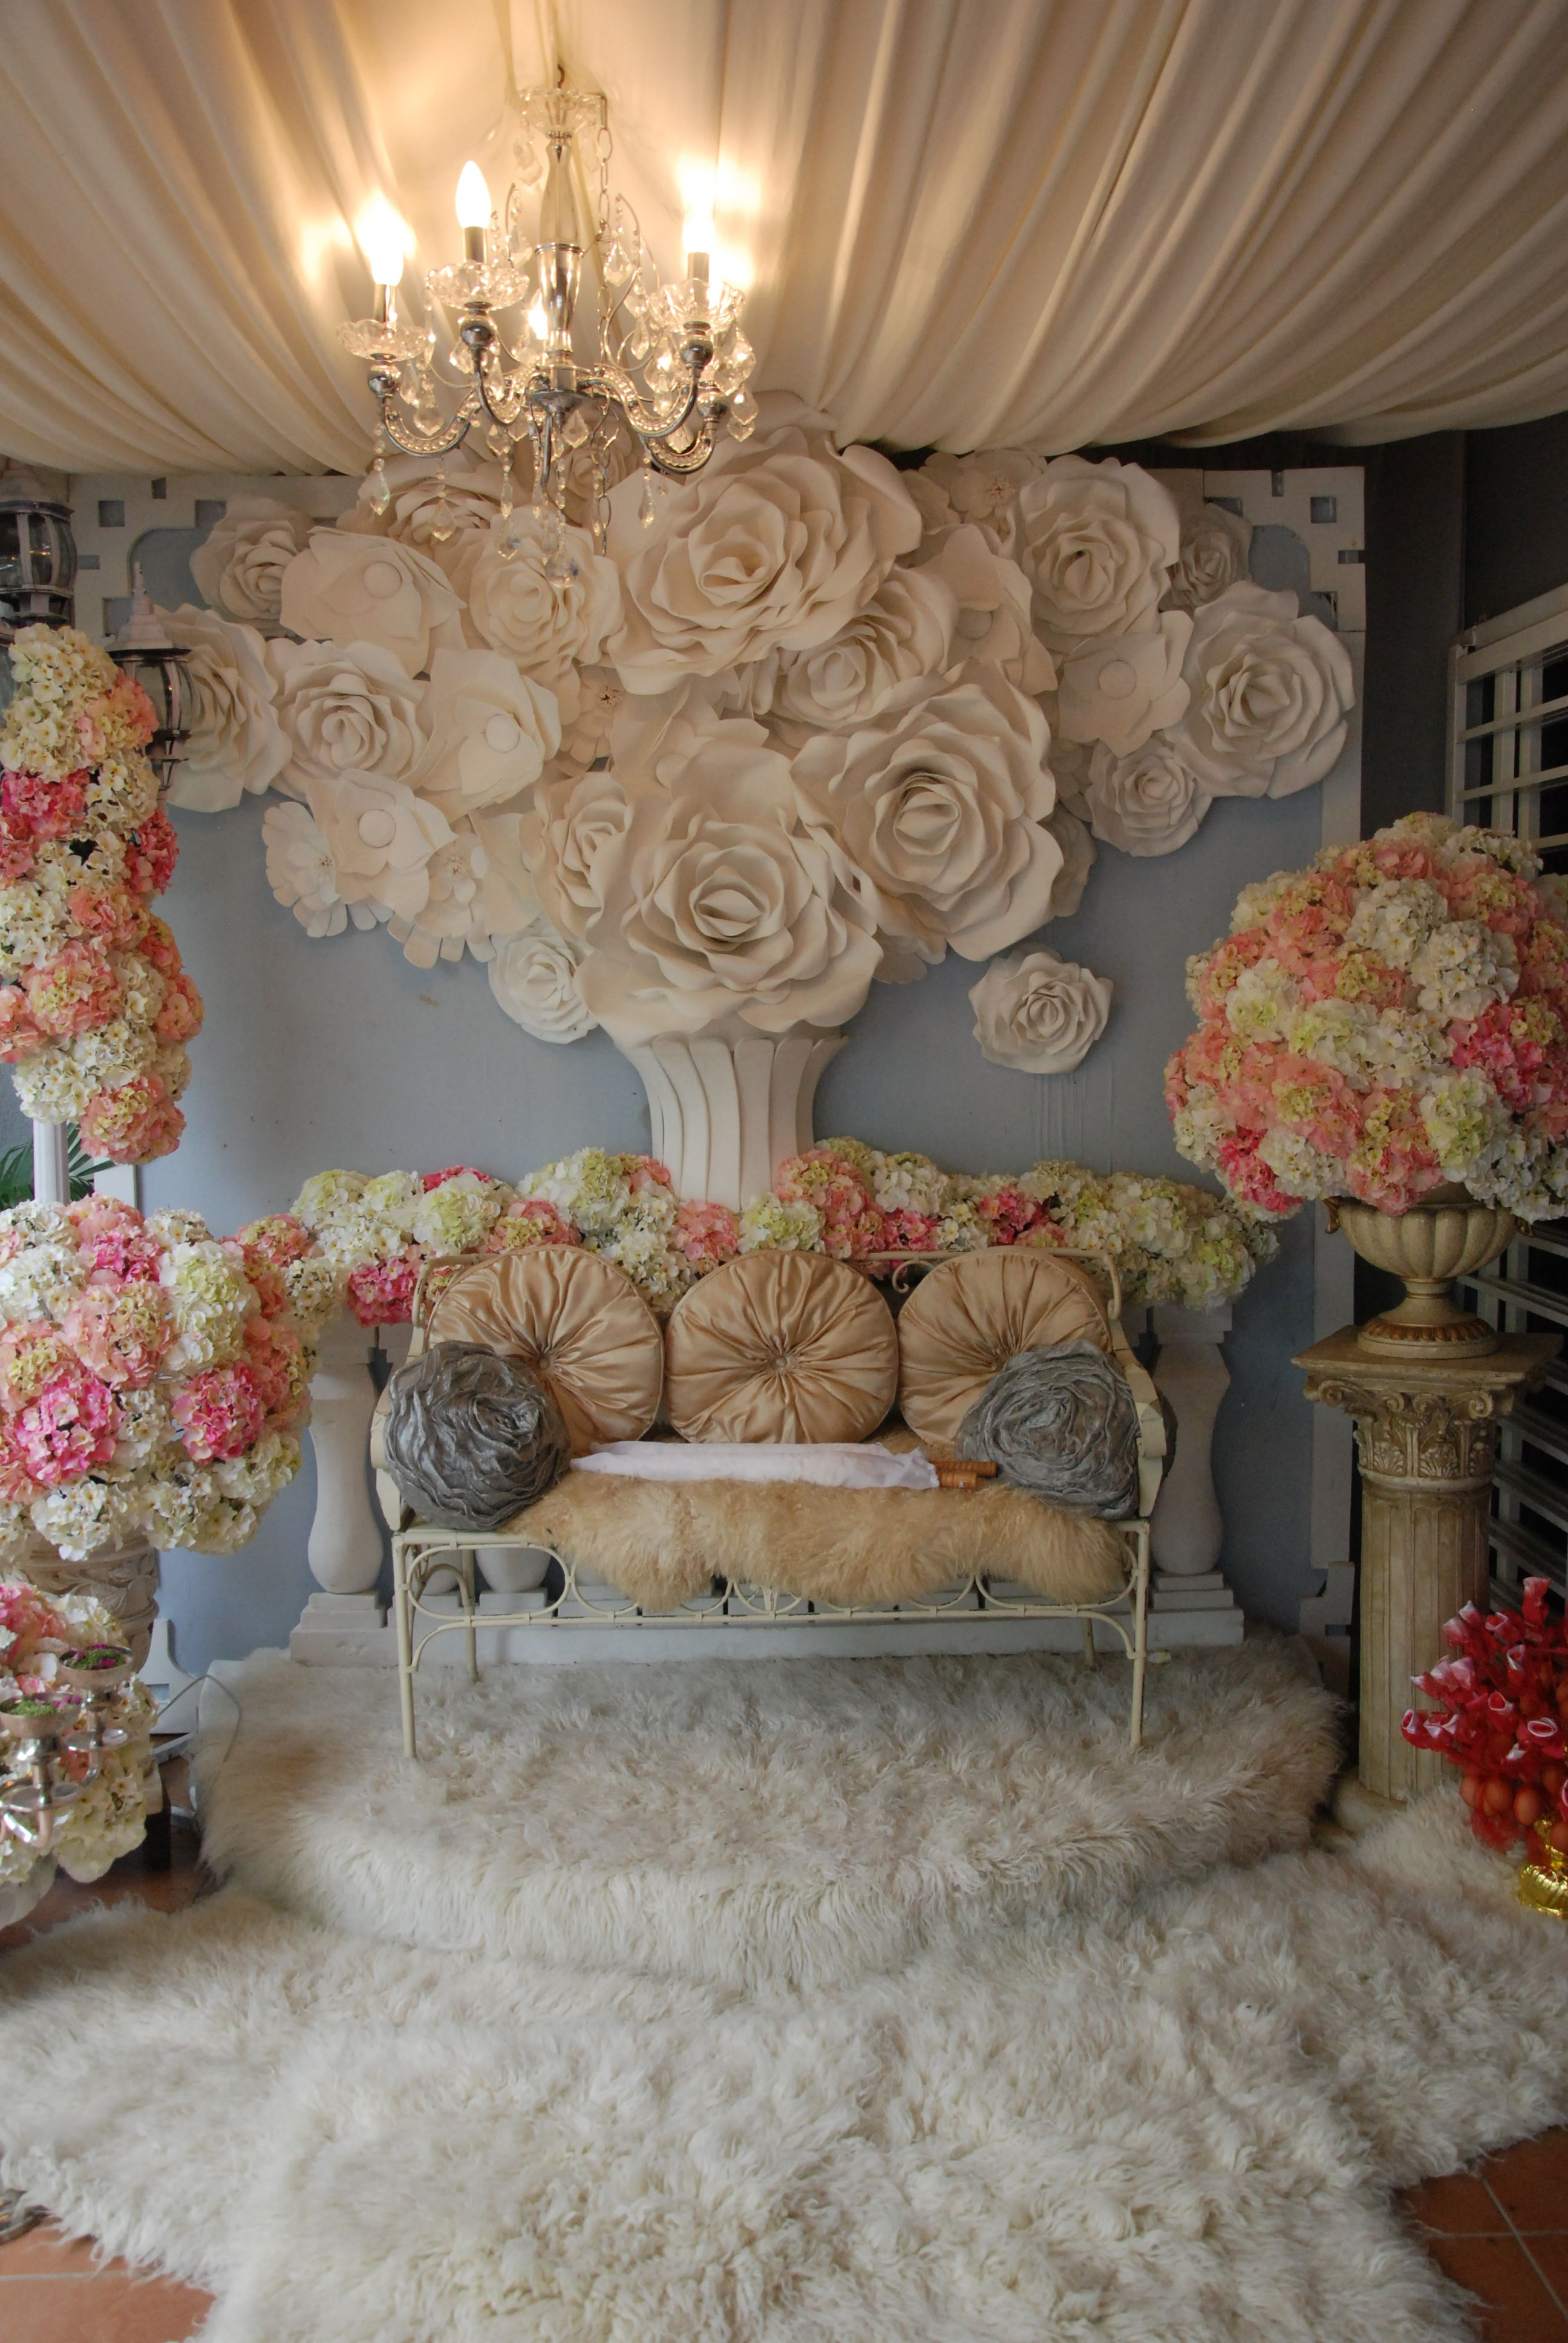 Unique wedding stage decoration ideas   floral work on this dscg   Photo